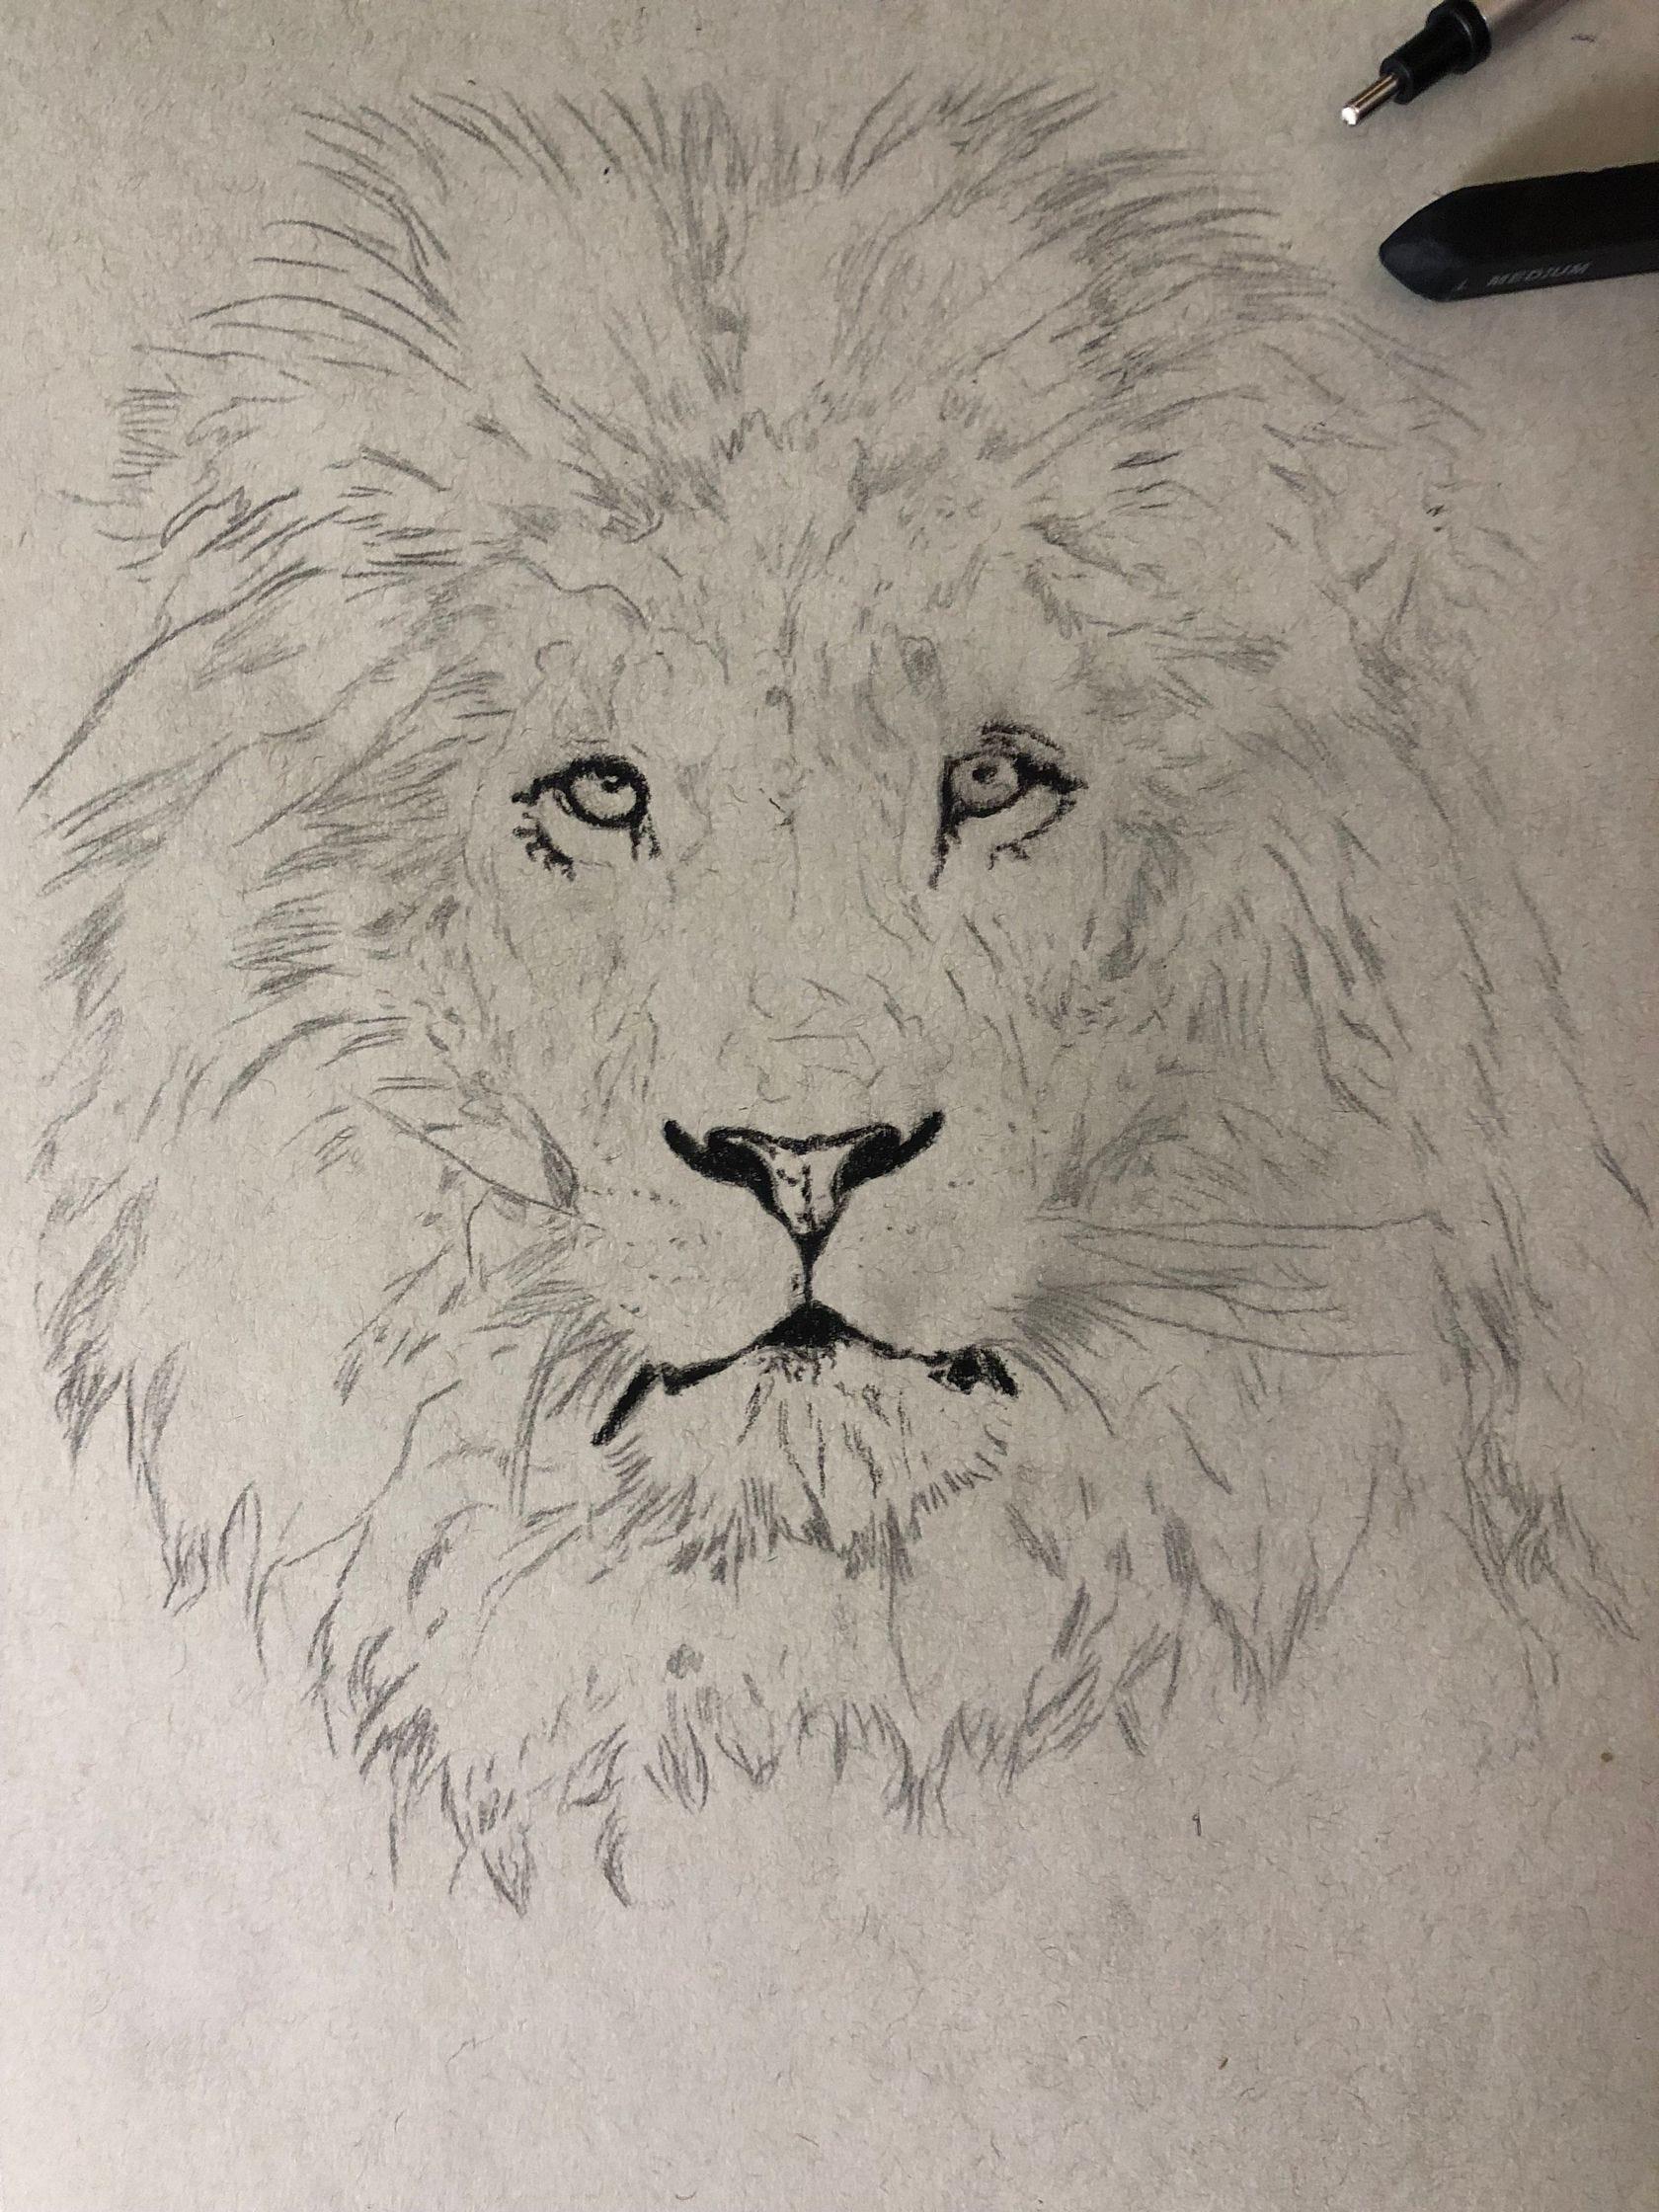 Lion Realistic Drawing : realistic, drawing, Drawing, Lion!, Realistic, Charcoal, @Simon, Medium